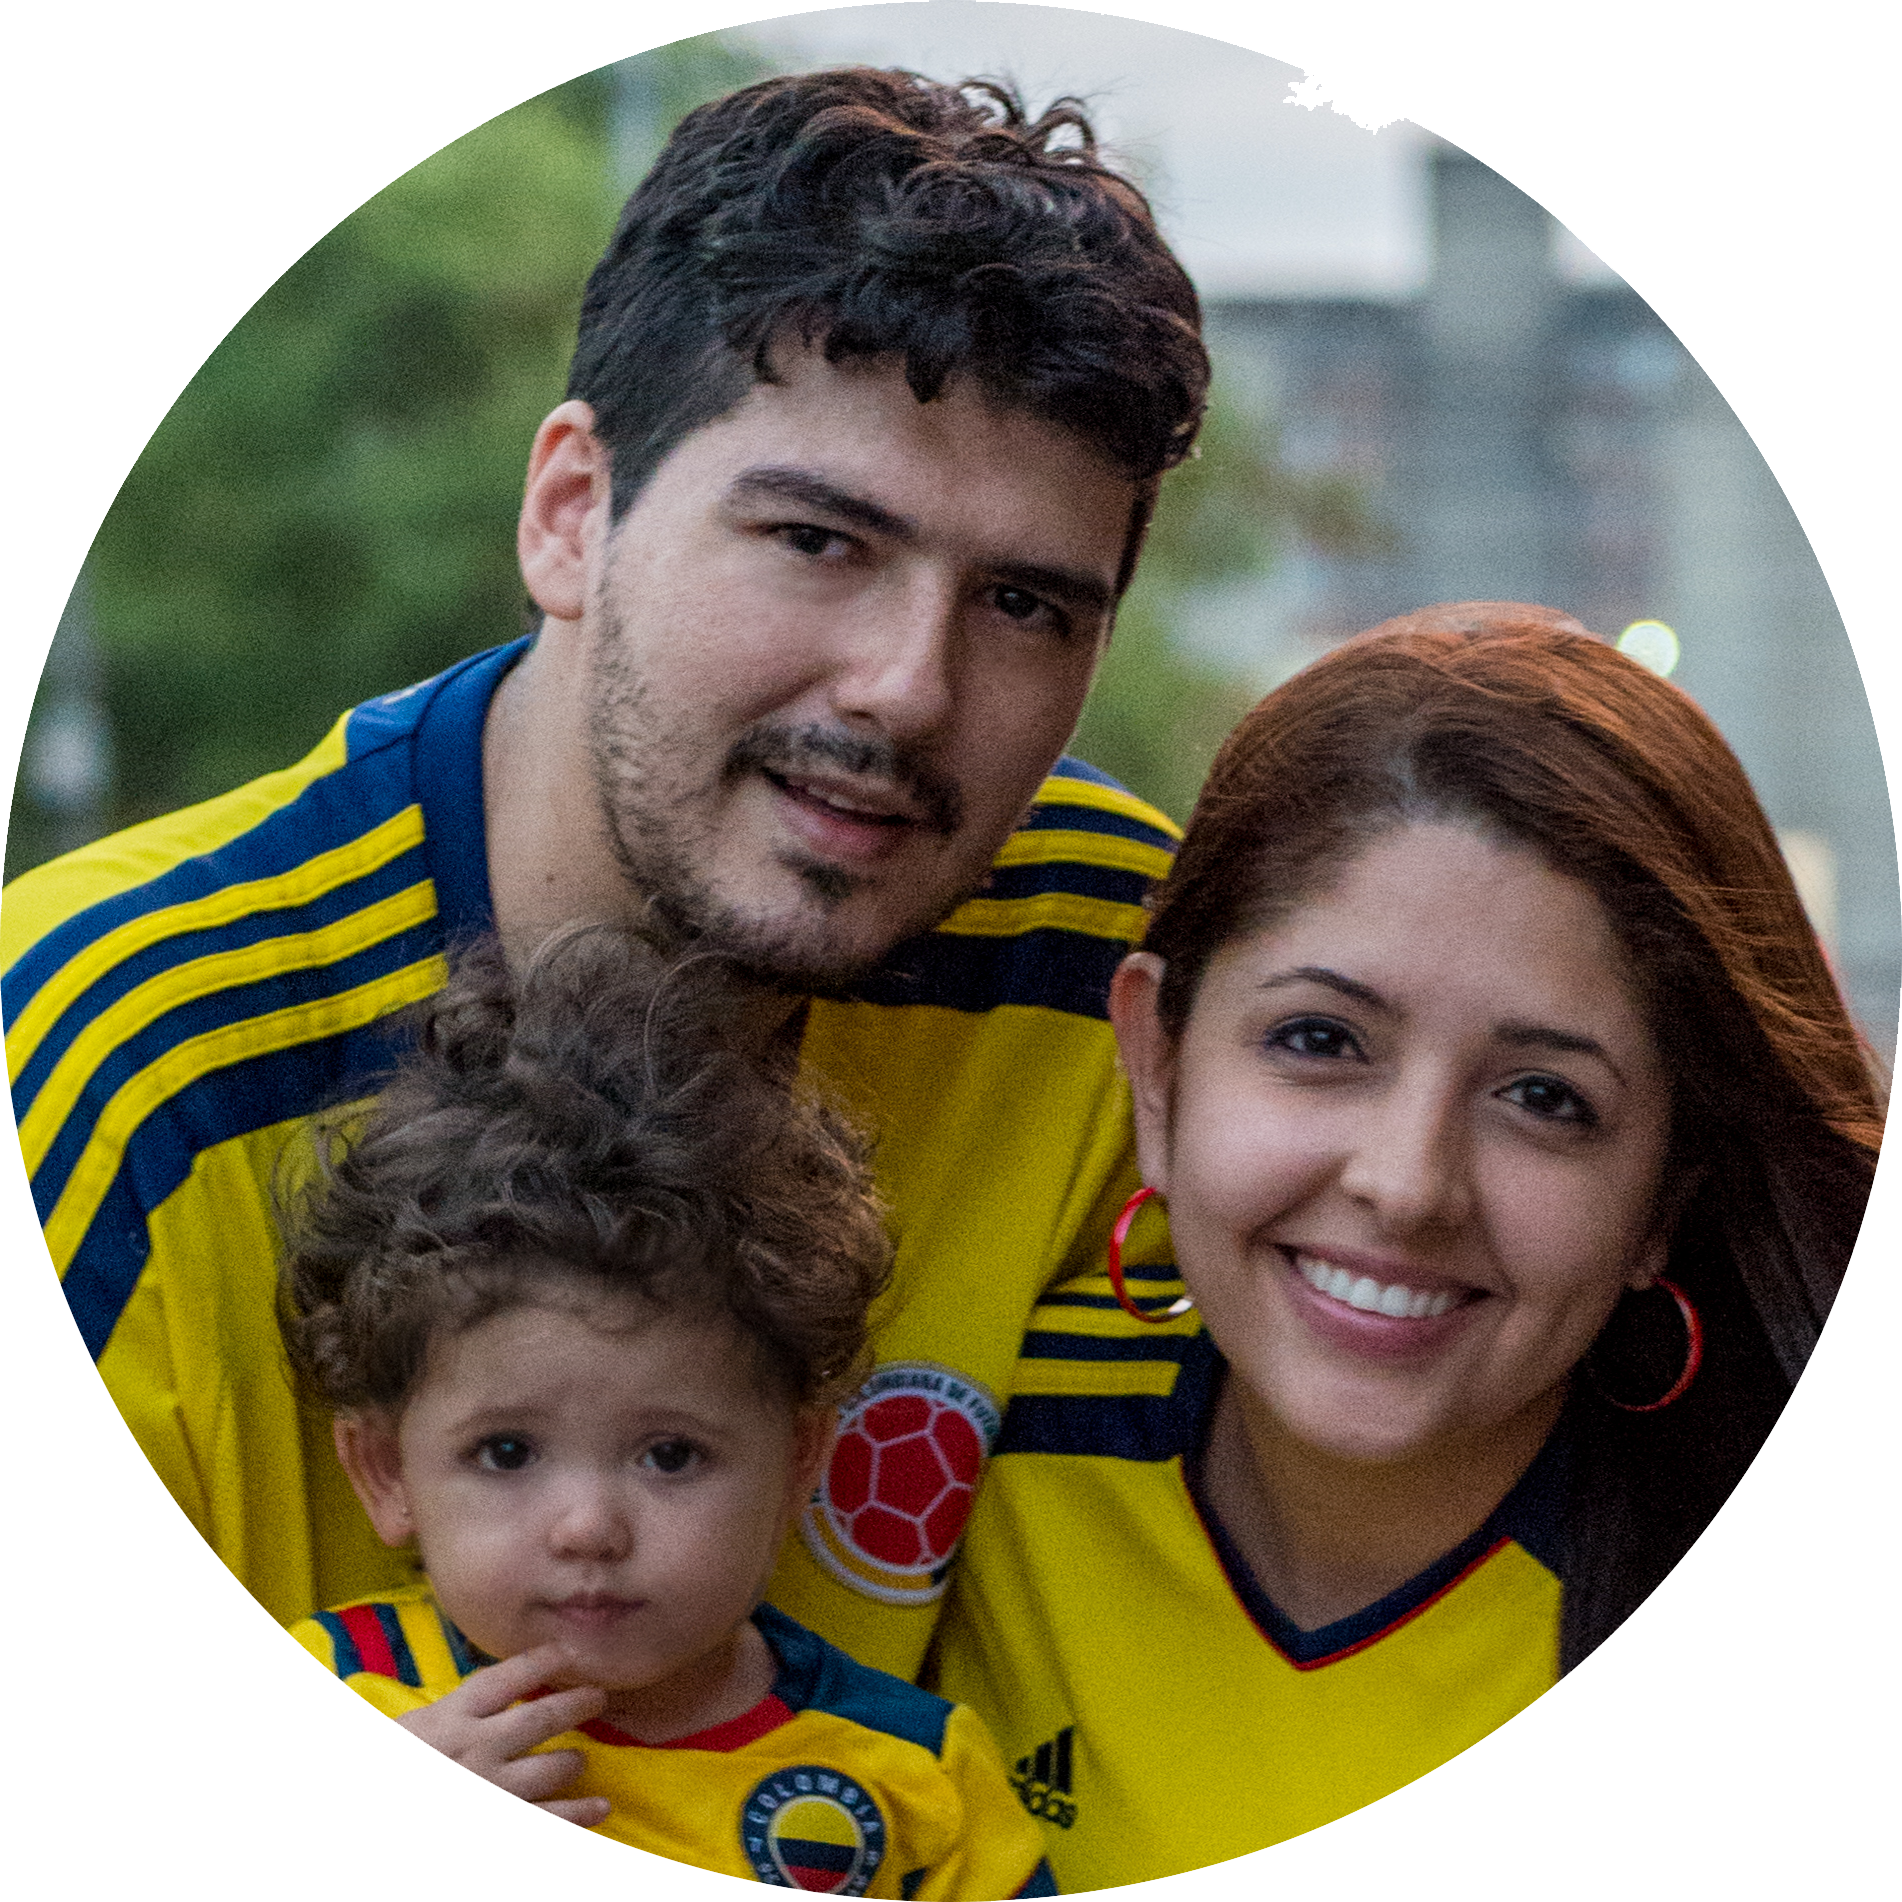 http://graduacion.unir.net/colombia/2016/wp-content/uploads/2016/11/Natalia-Hernández-Serna.png